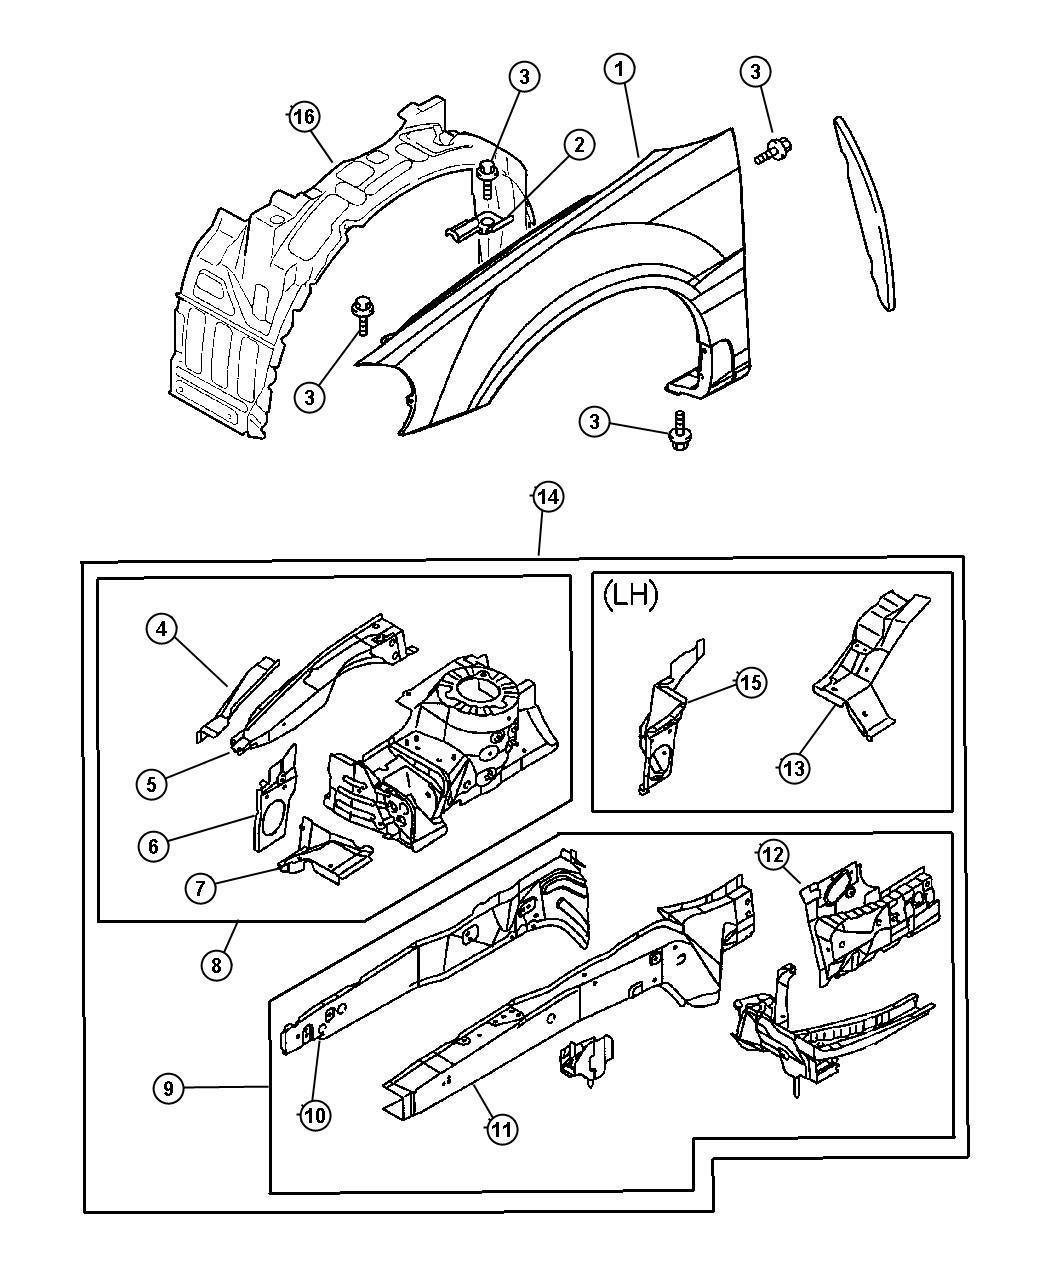 2002 dodge neon engine diagram 360 firing order rear strut free image